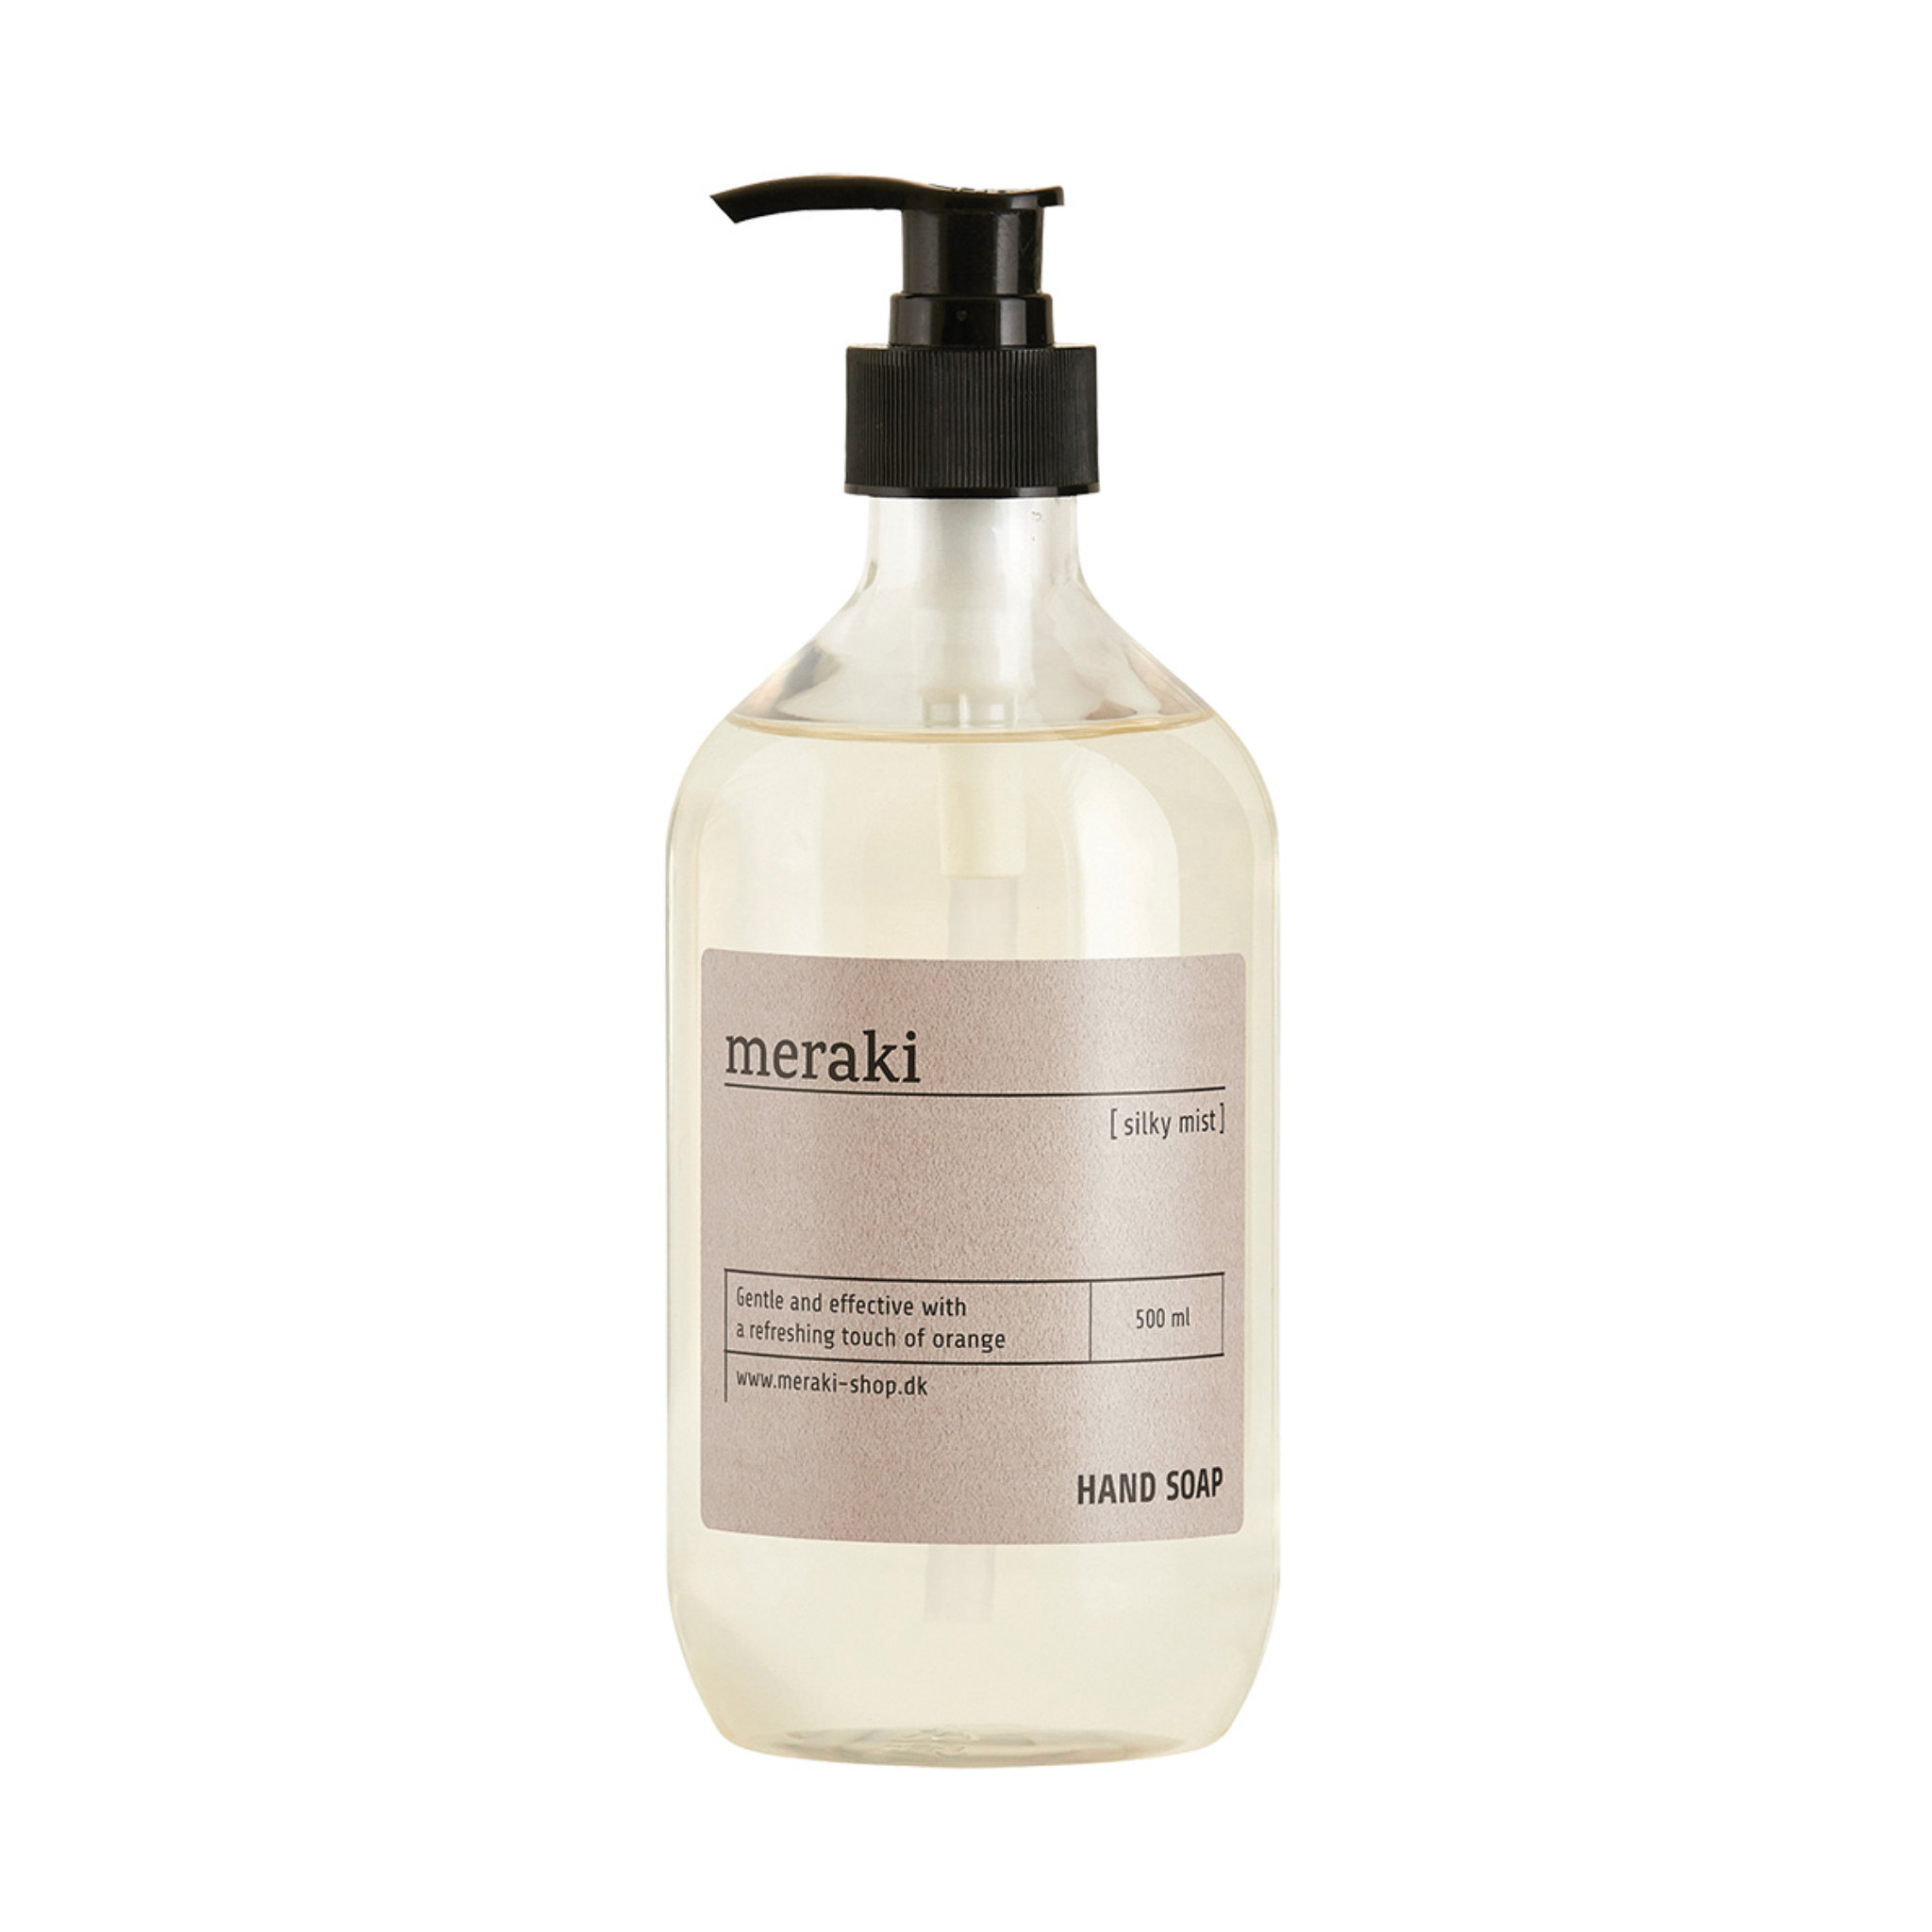 Meraki Hand Soap- Silky Mist